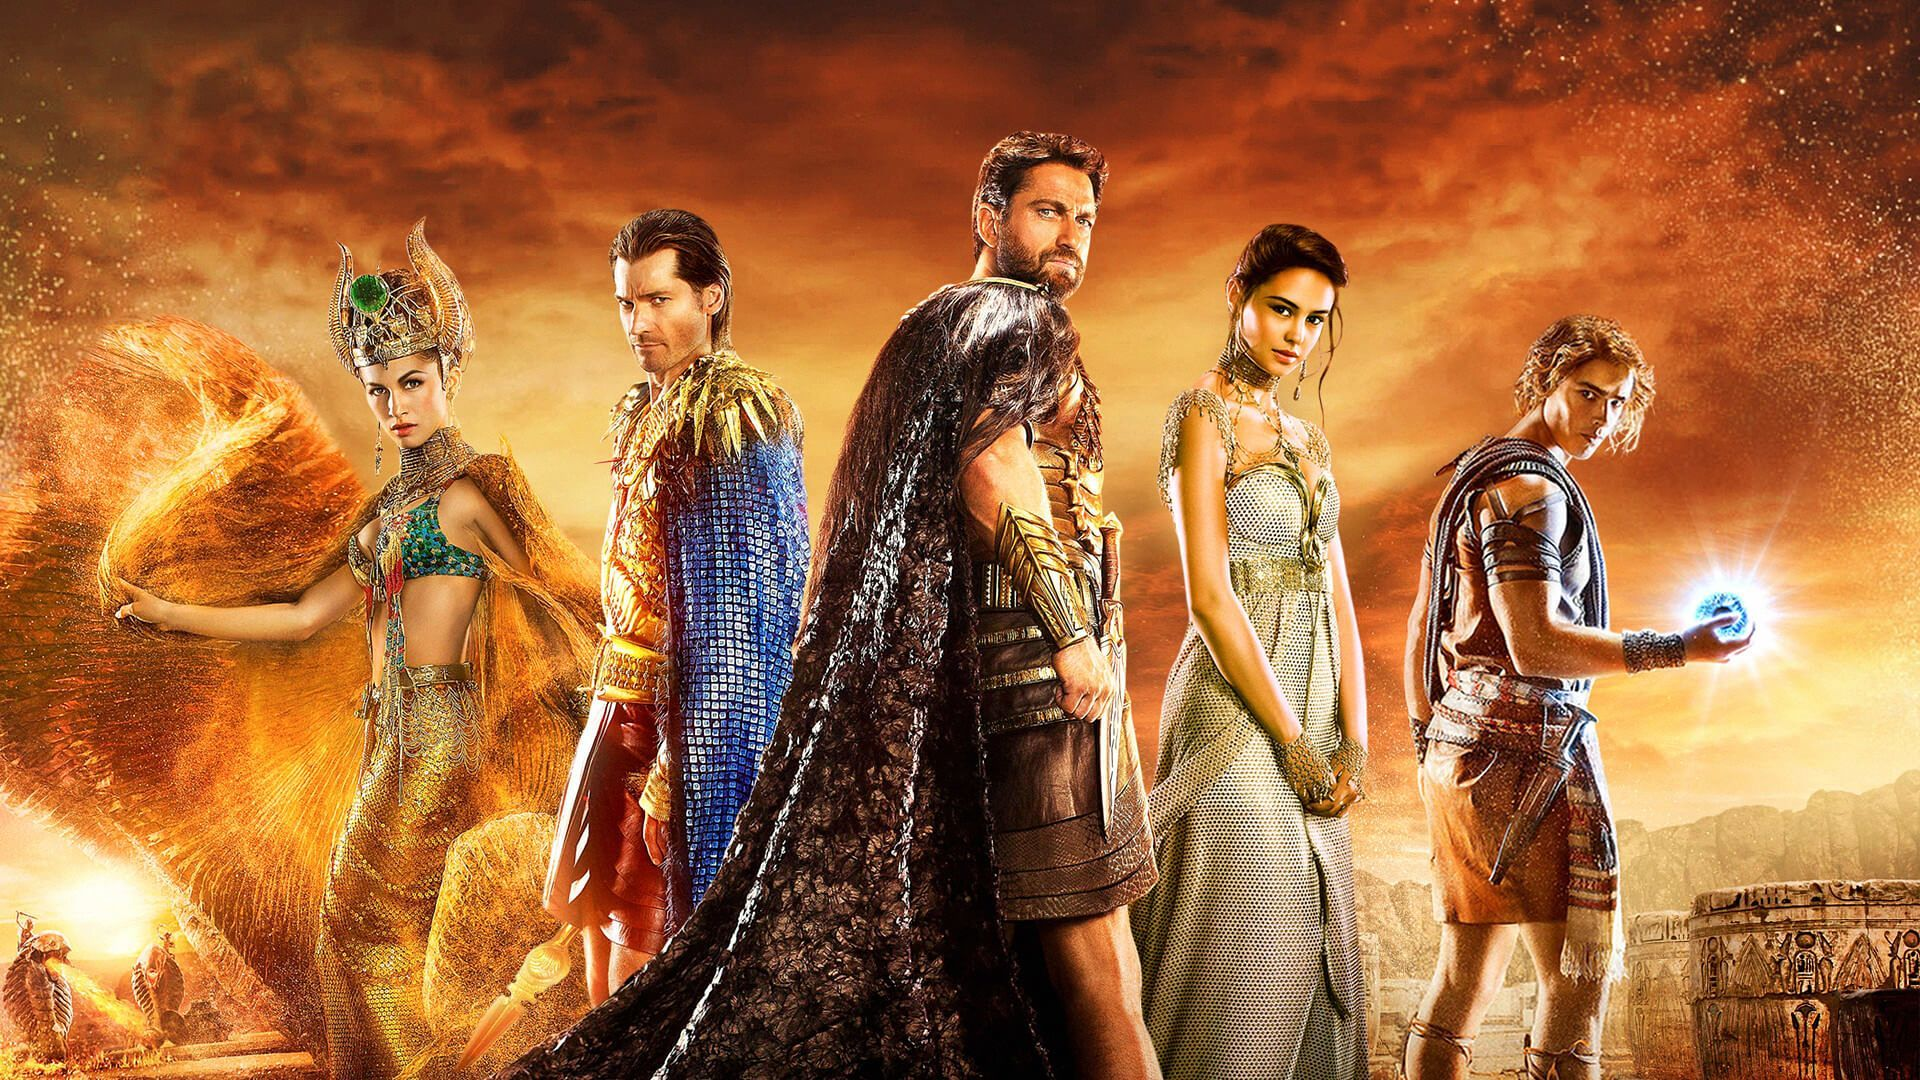 Gods Of Egypt Google Search Gods Of Egypt Movie Egypt Movie Gods Of Egypt